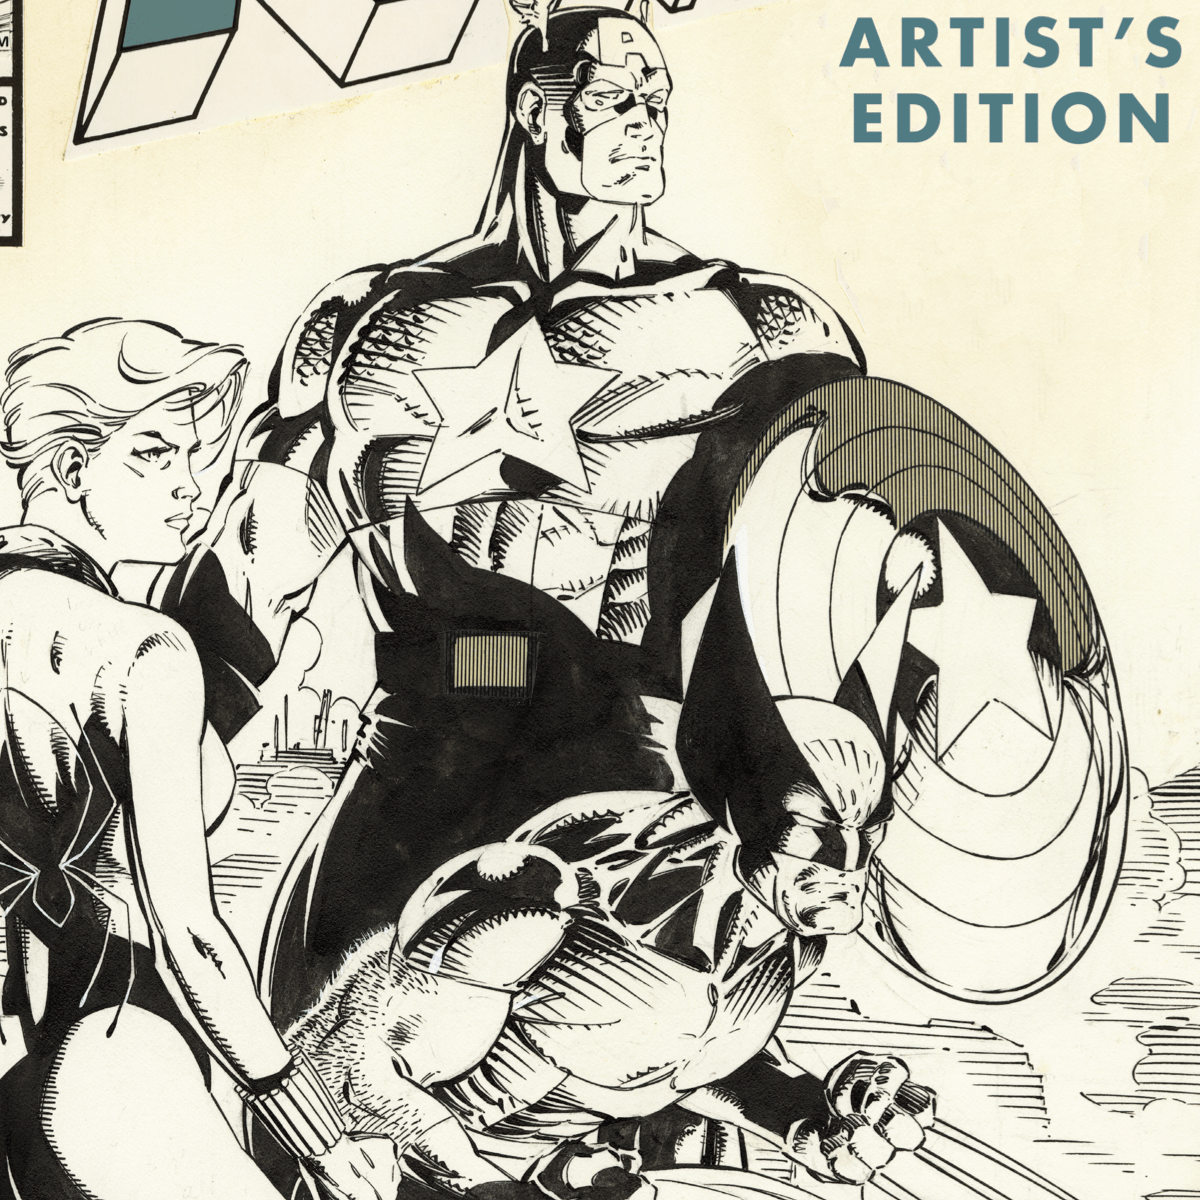 'Jim Lee's X-Men: Artist's Edition' is a fascinating, even Uncanny archive